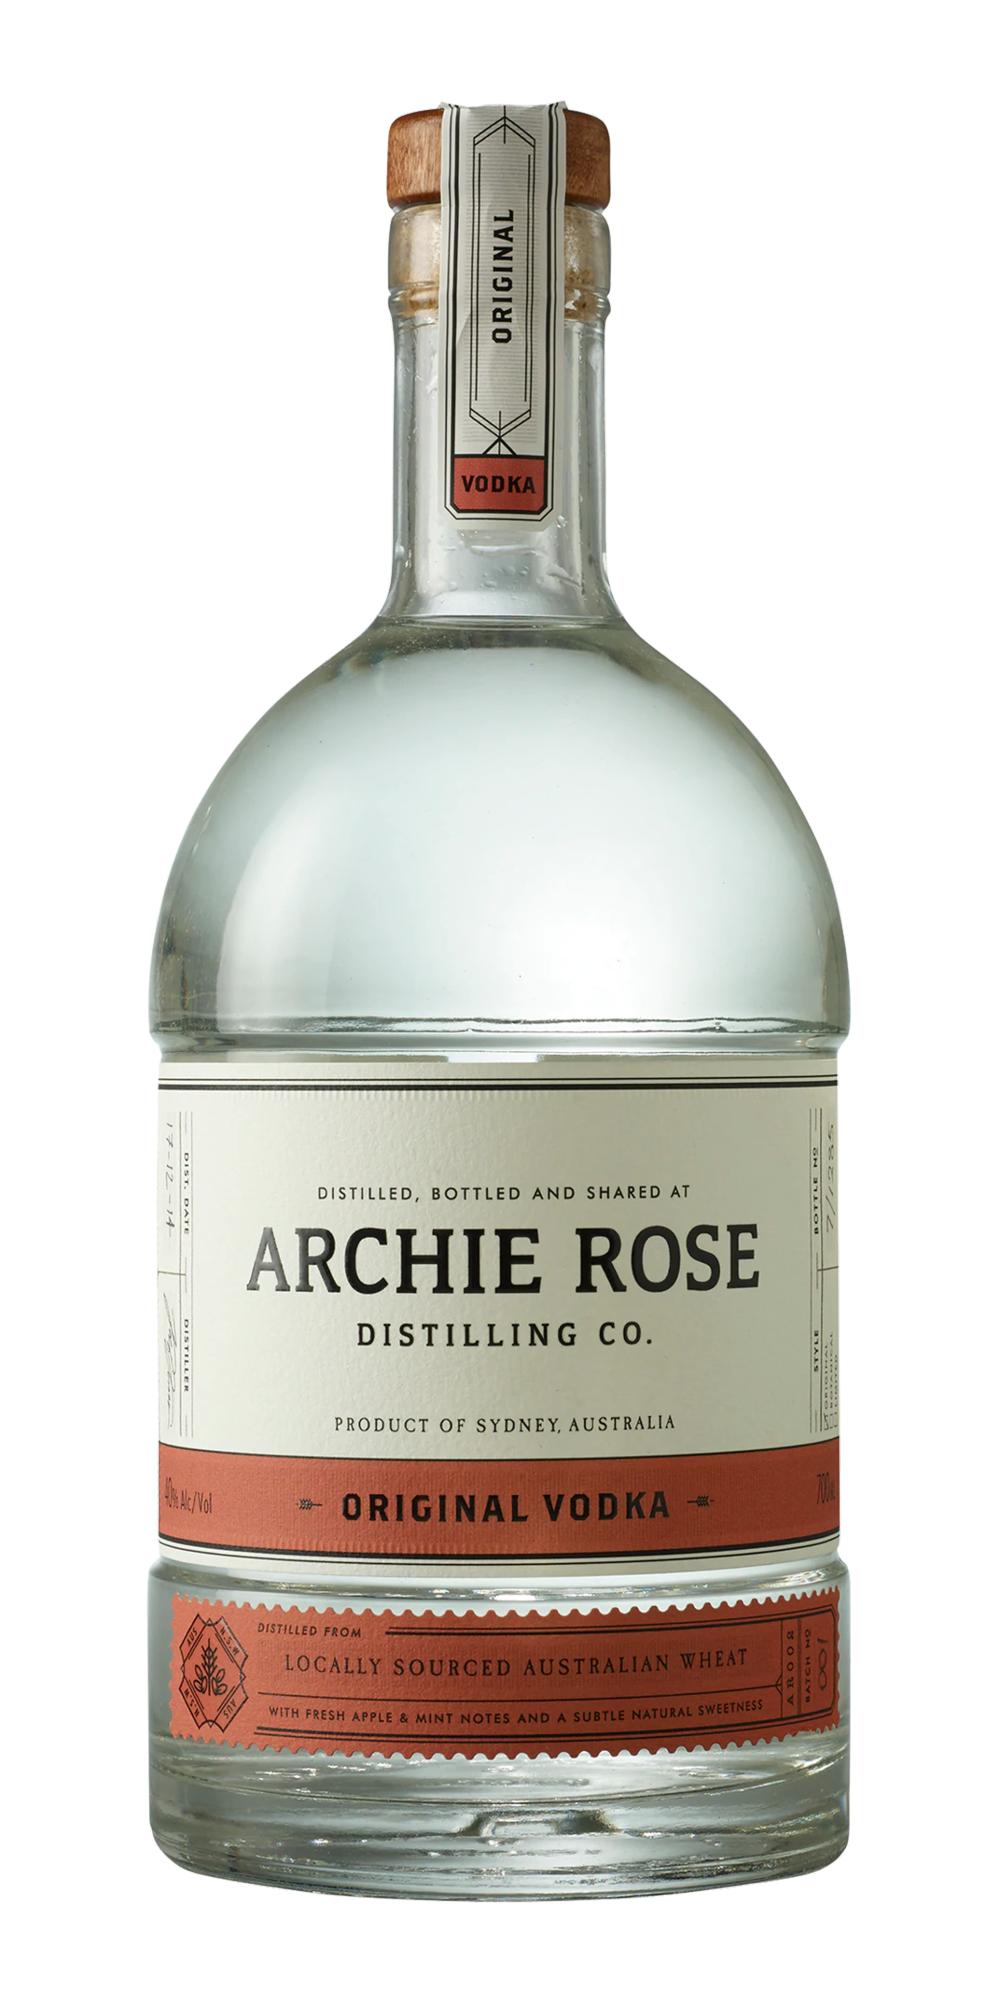 Copy of Archie Rose Original Vodka